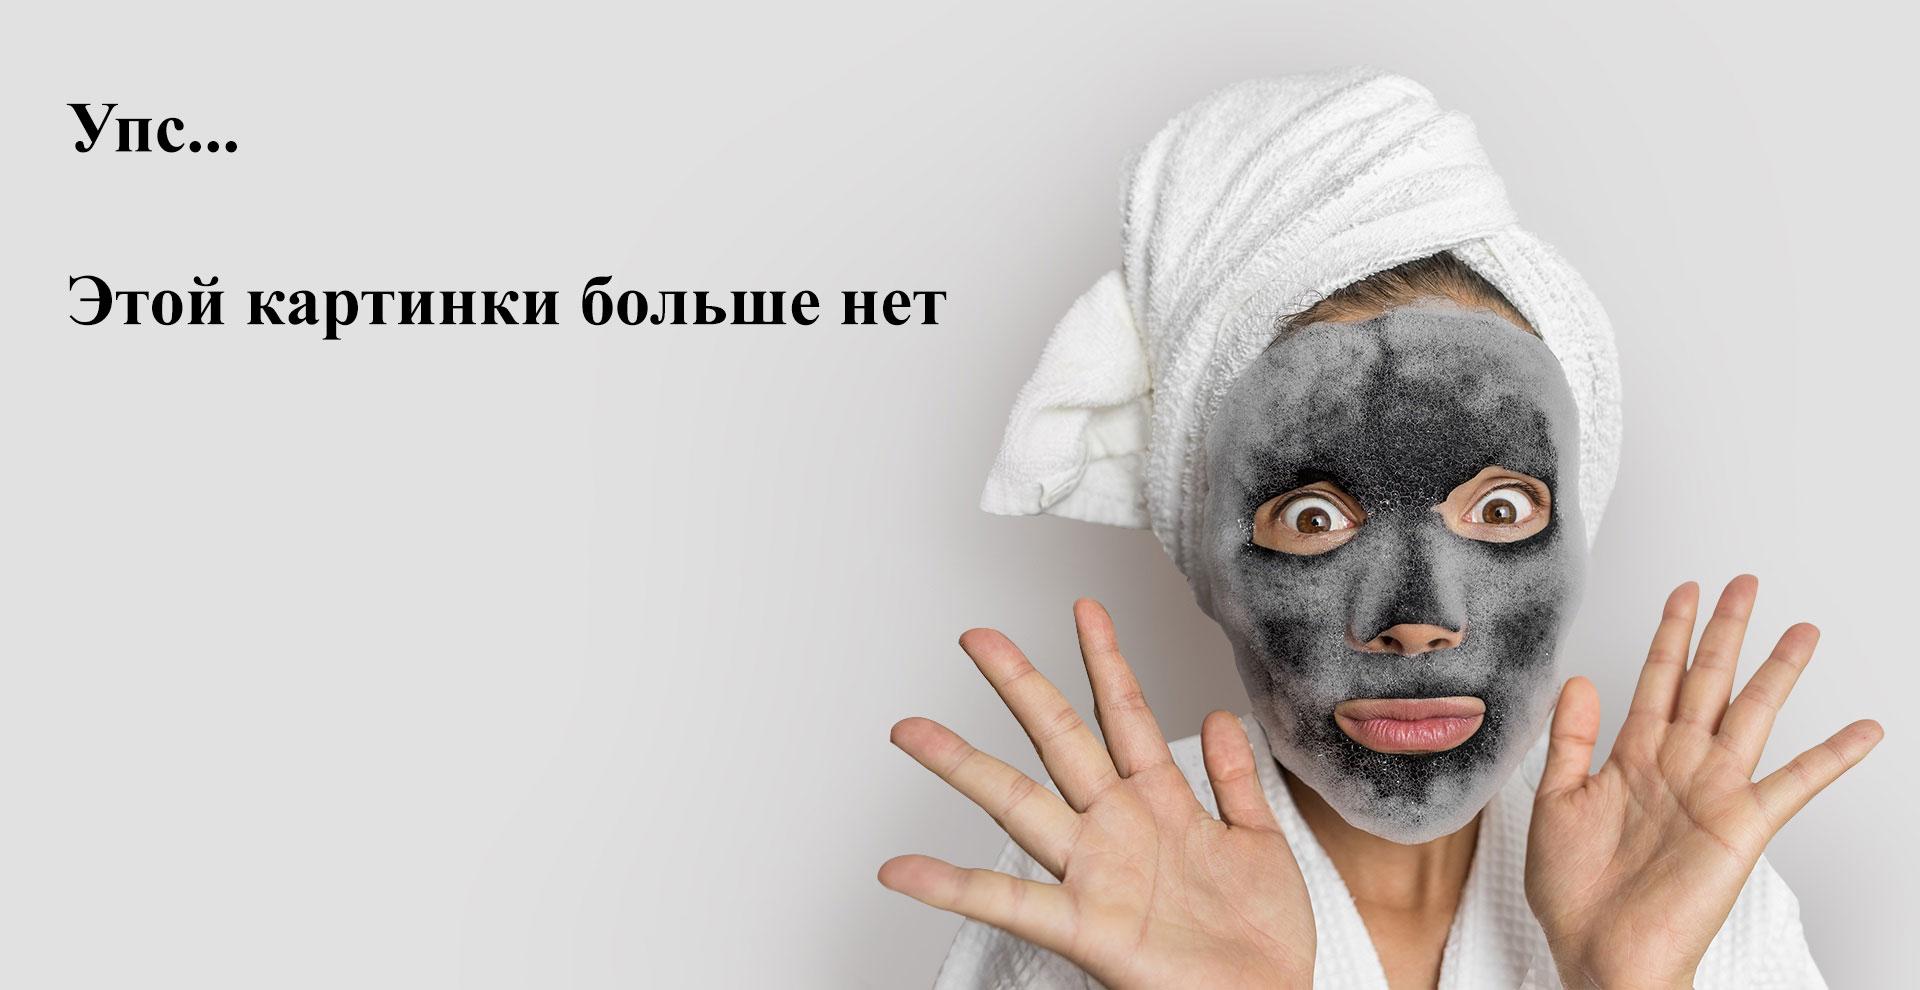 WULA Nailsoul, Крем для рук «Абрикос и масло ши», 200 мл